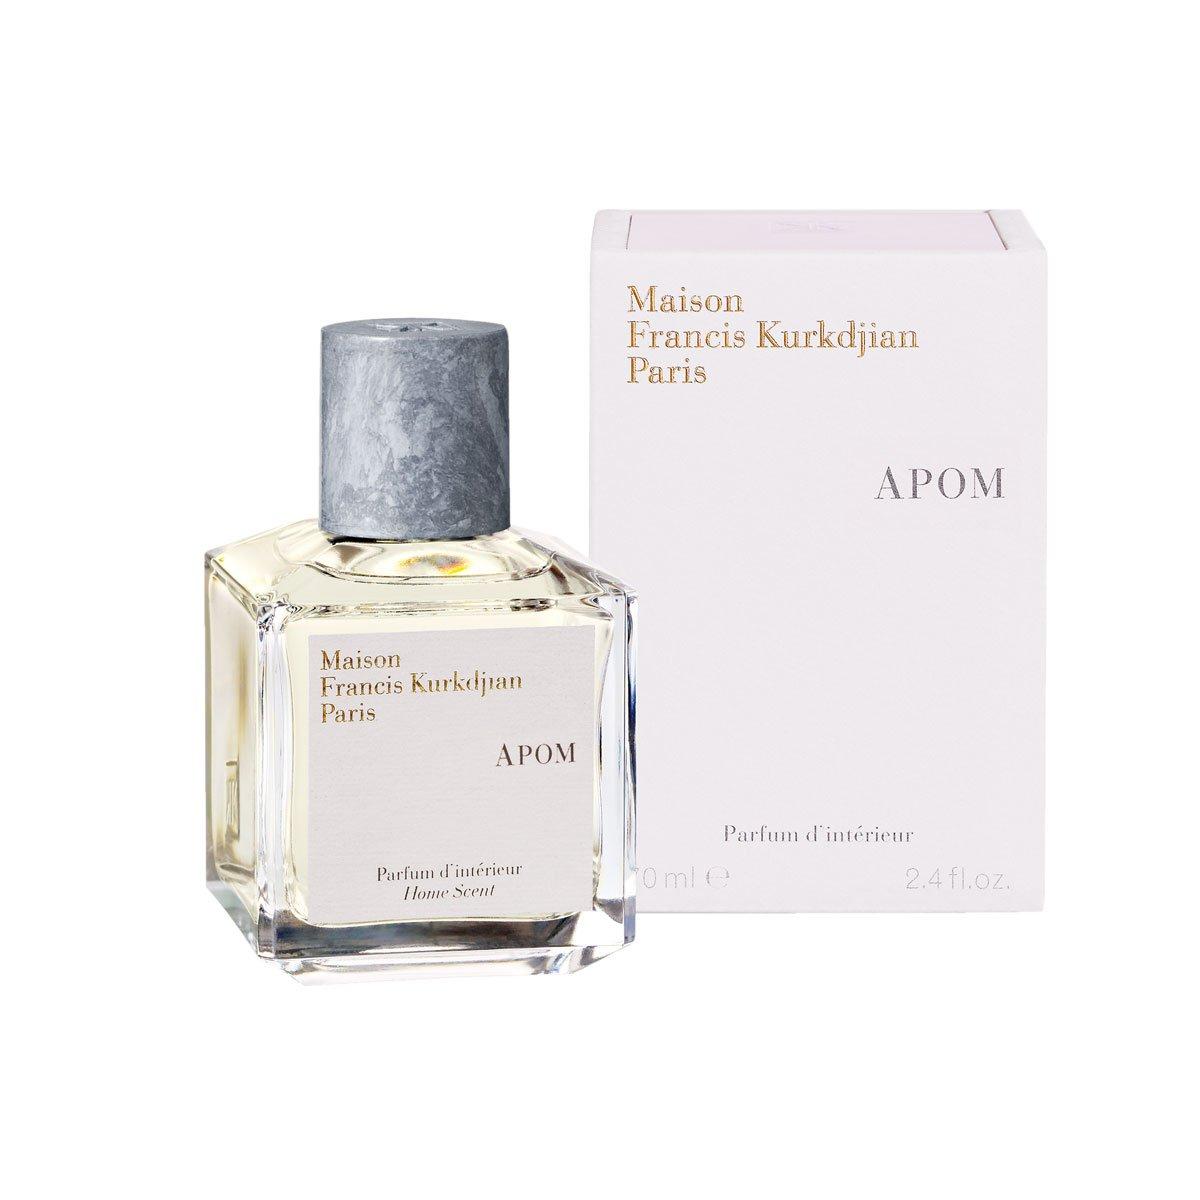 Interior Perfume APOM